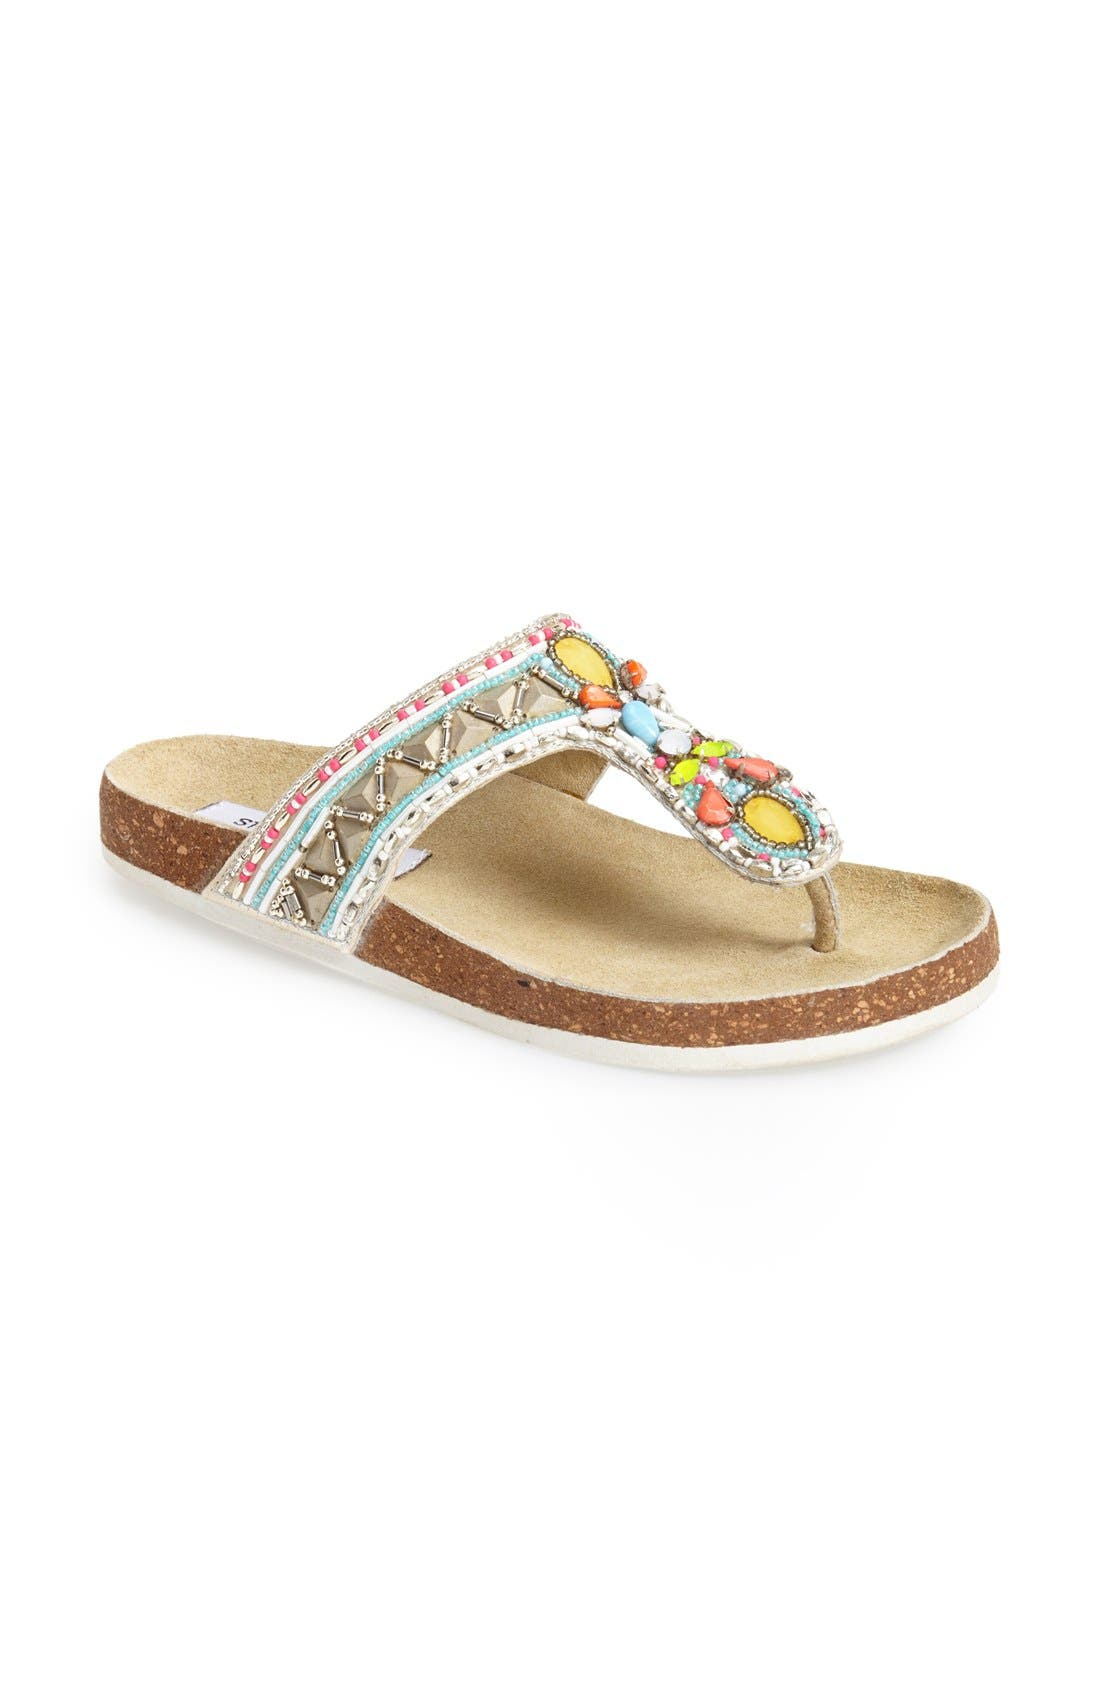 Alternate Image 1 Selected - Steve Madden 'Fiessta' Embellished Thong Sandal (Women)